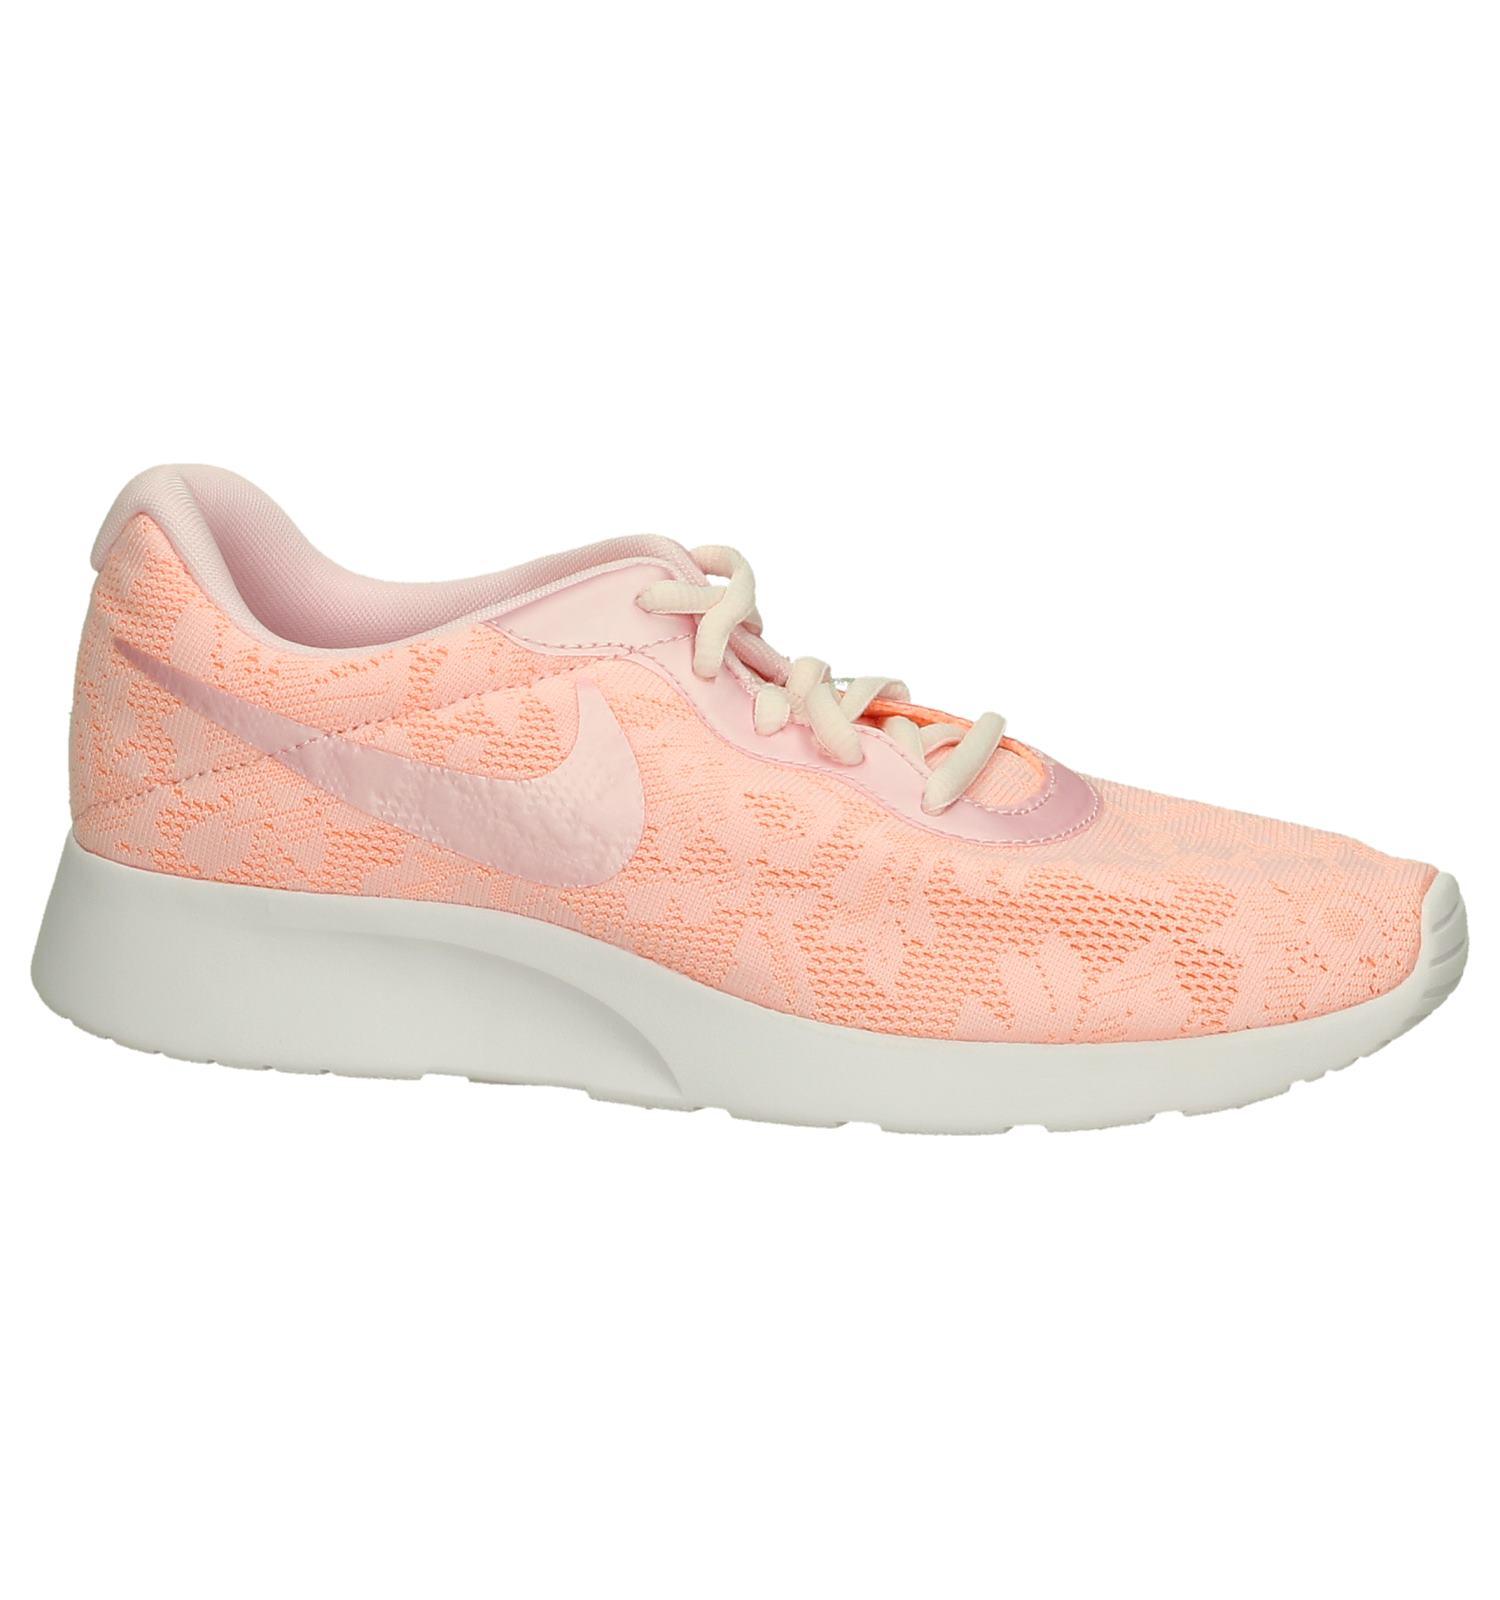 afcaa11e8ed Roze Sneaker Runner Nike Tanjun | TORFS.BE | Gratis verzend en retour